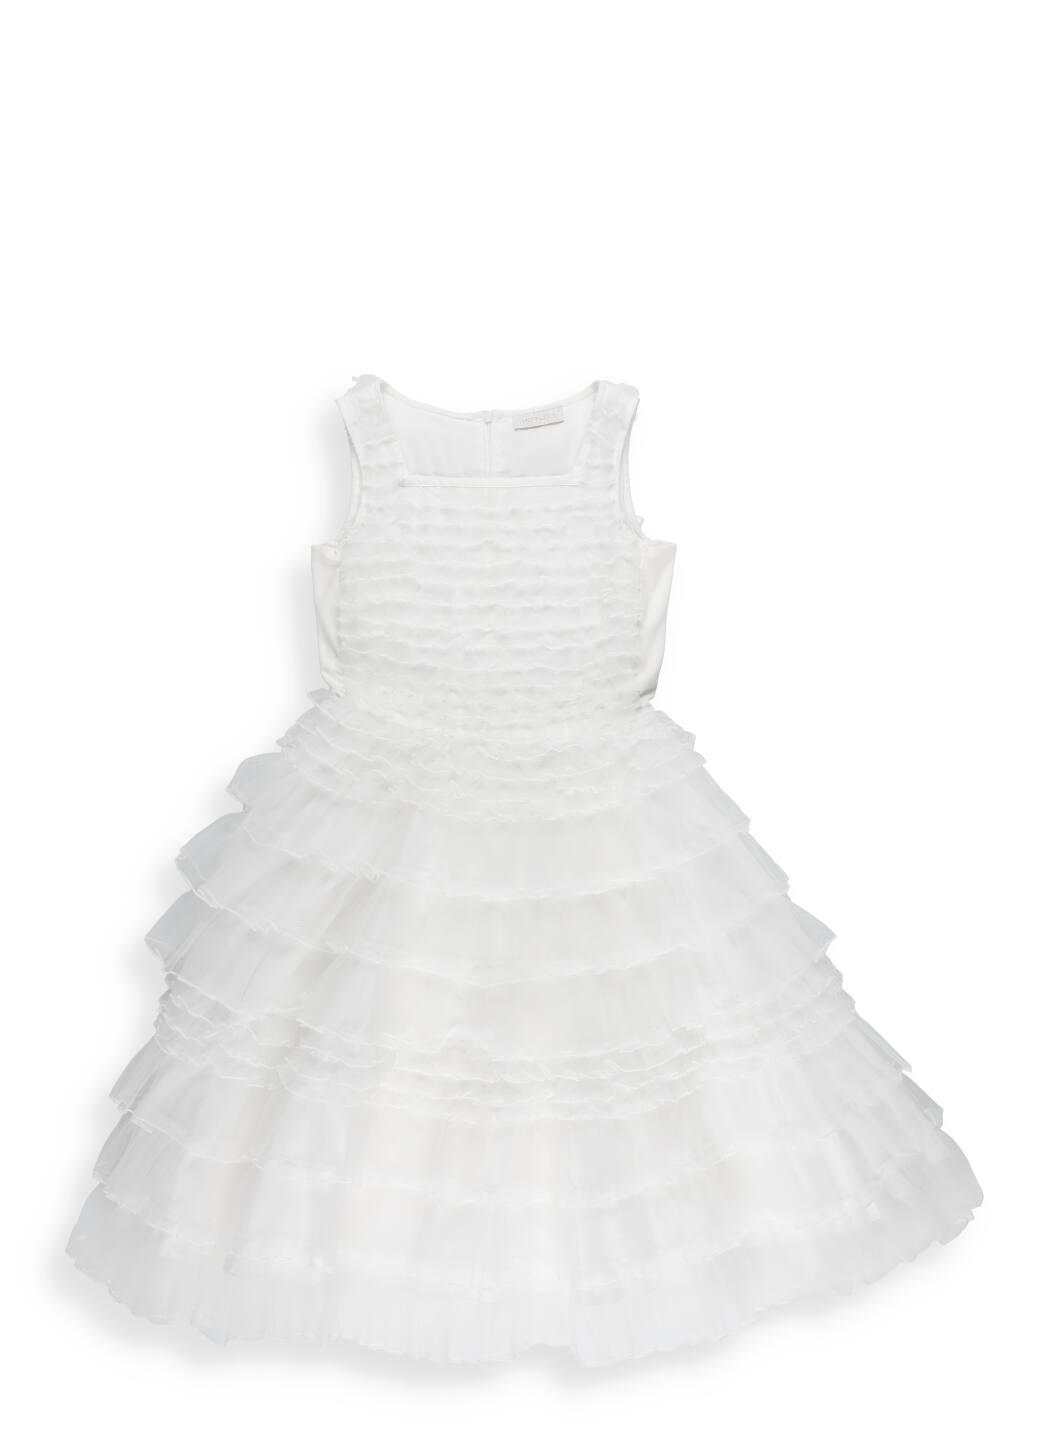 Monnalisa Tulle Galette Dress